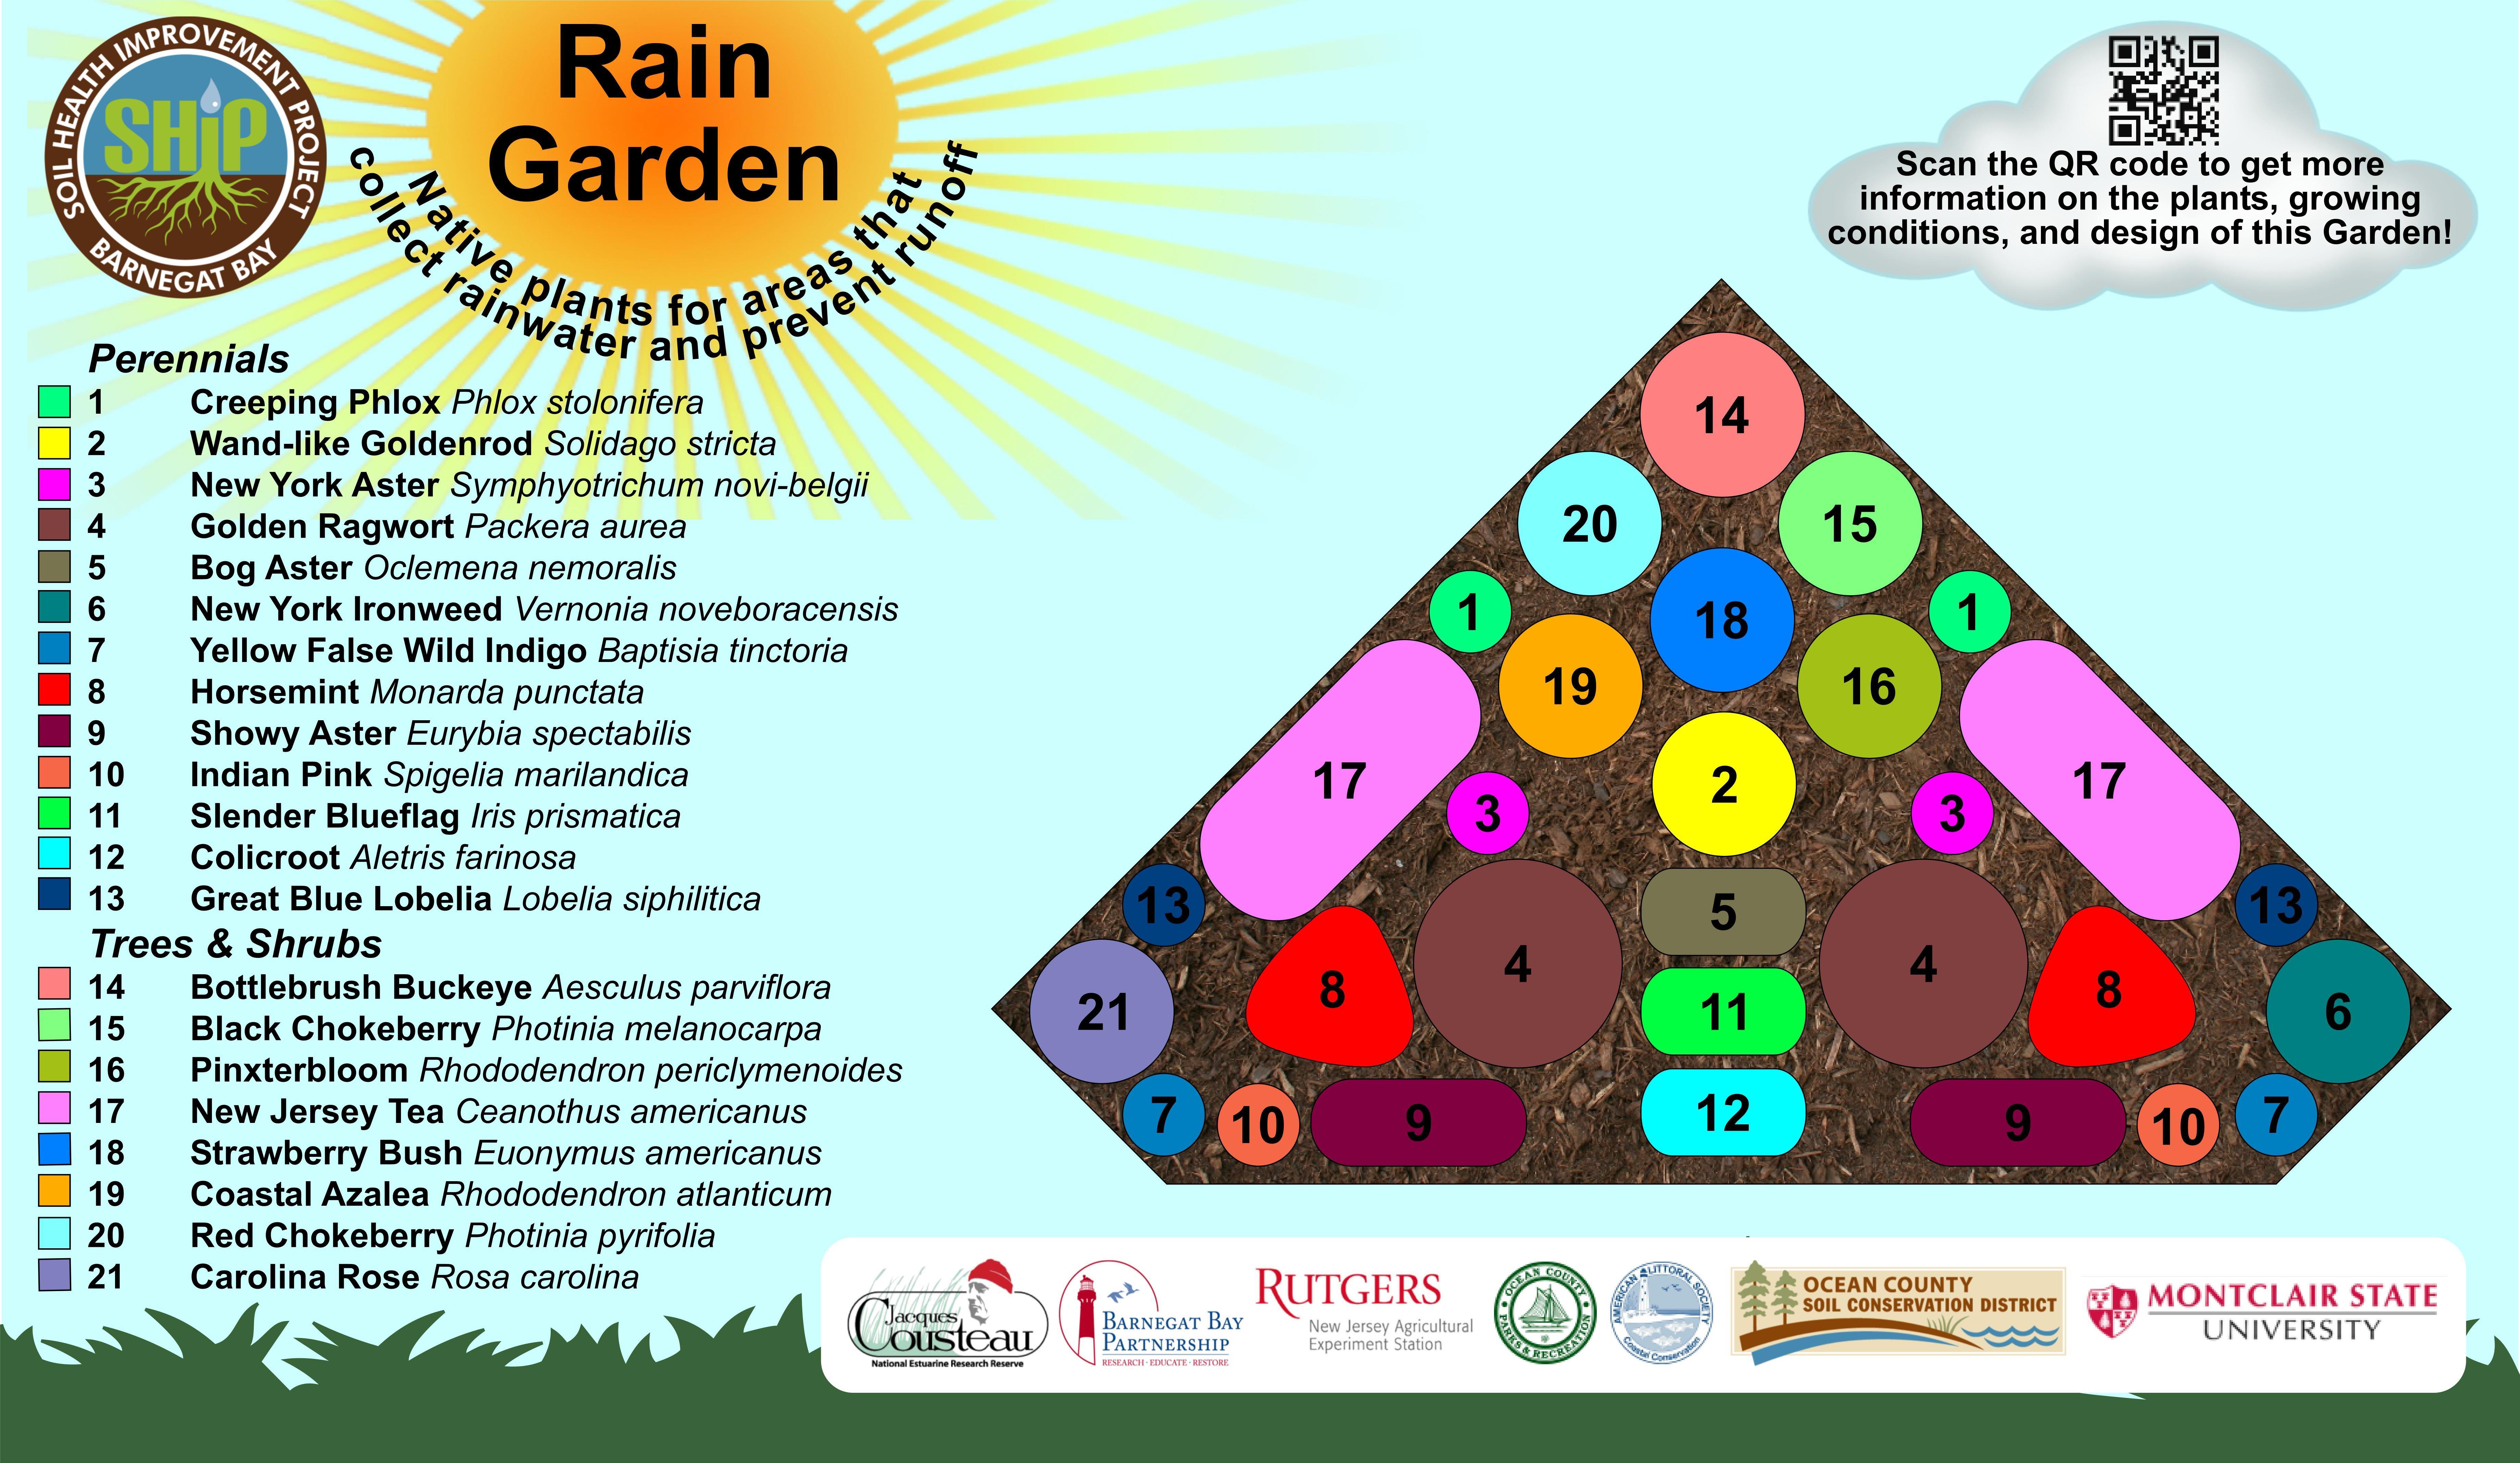 Jakes Branch Rain Garden – Rain Garden Plants